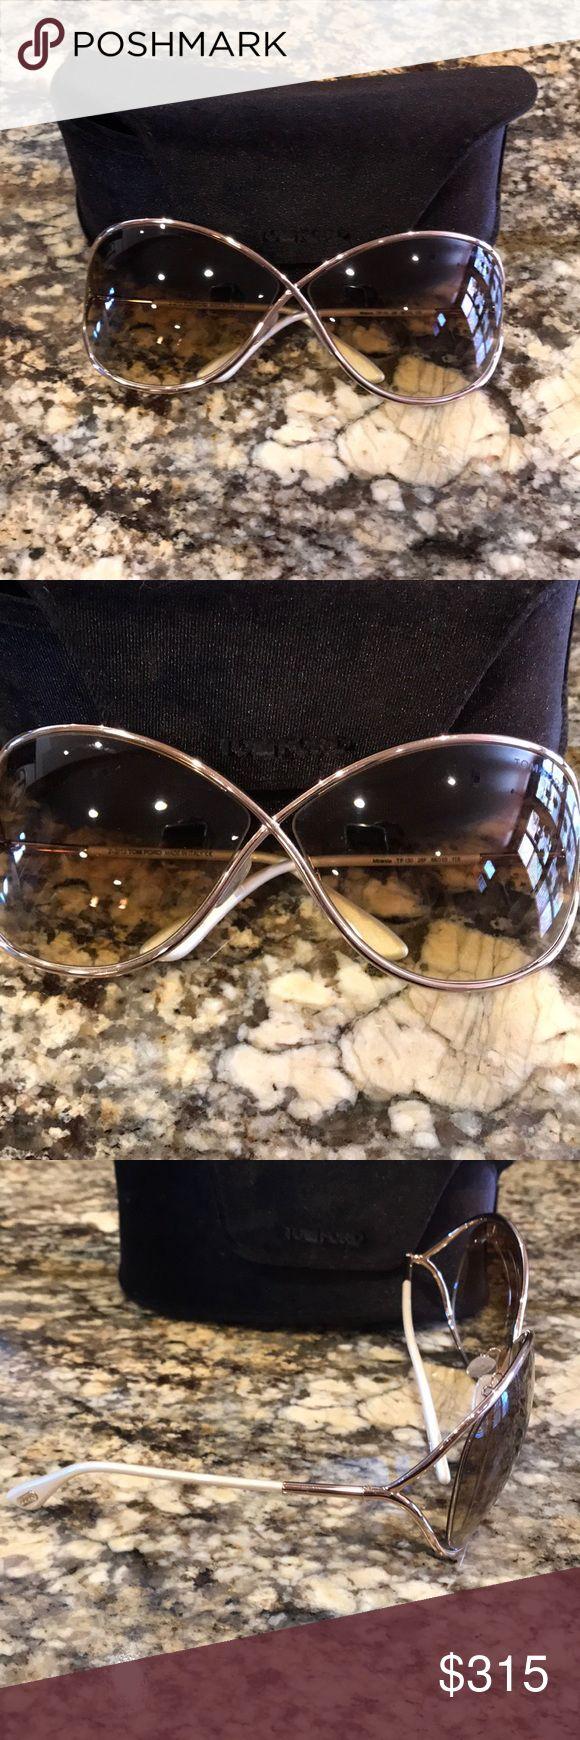 Tom Ford Gd Miranda Sunglasses Tom Ford Gold Miranda Sunglasses Tom Ford Accessories Sunglasses